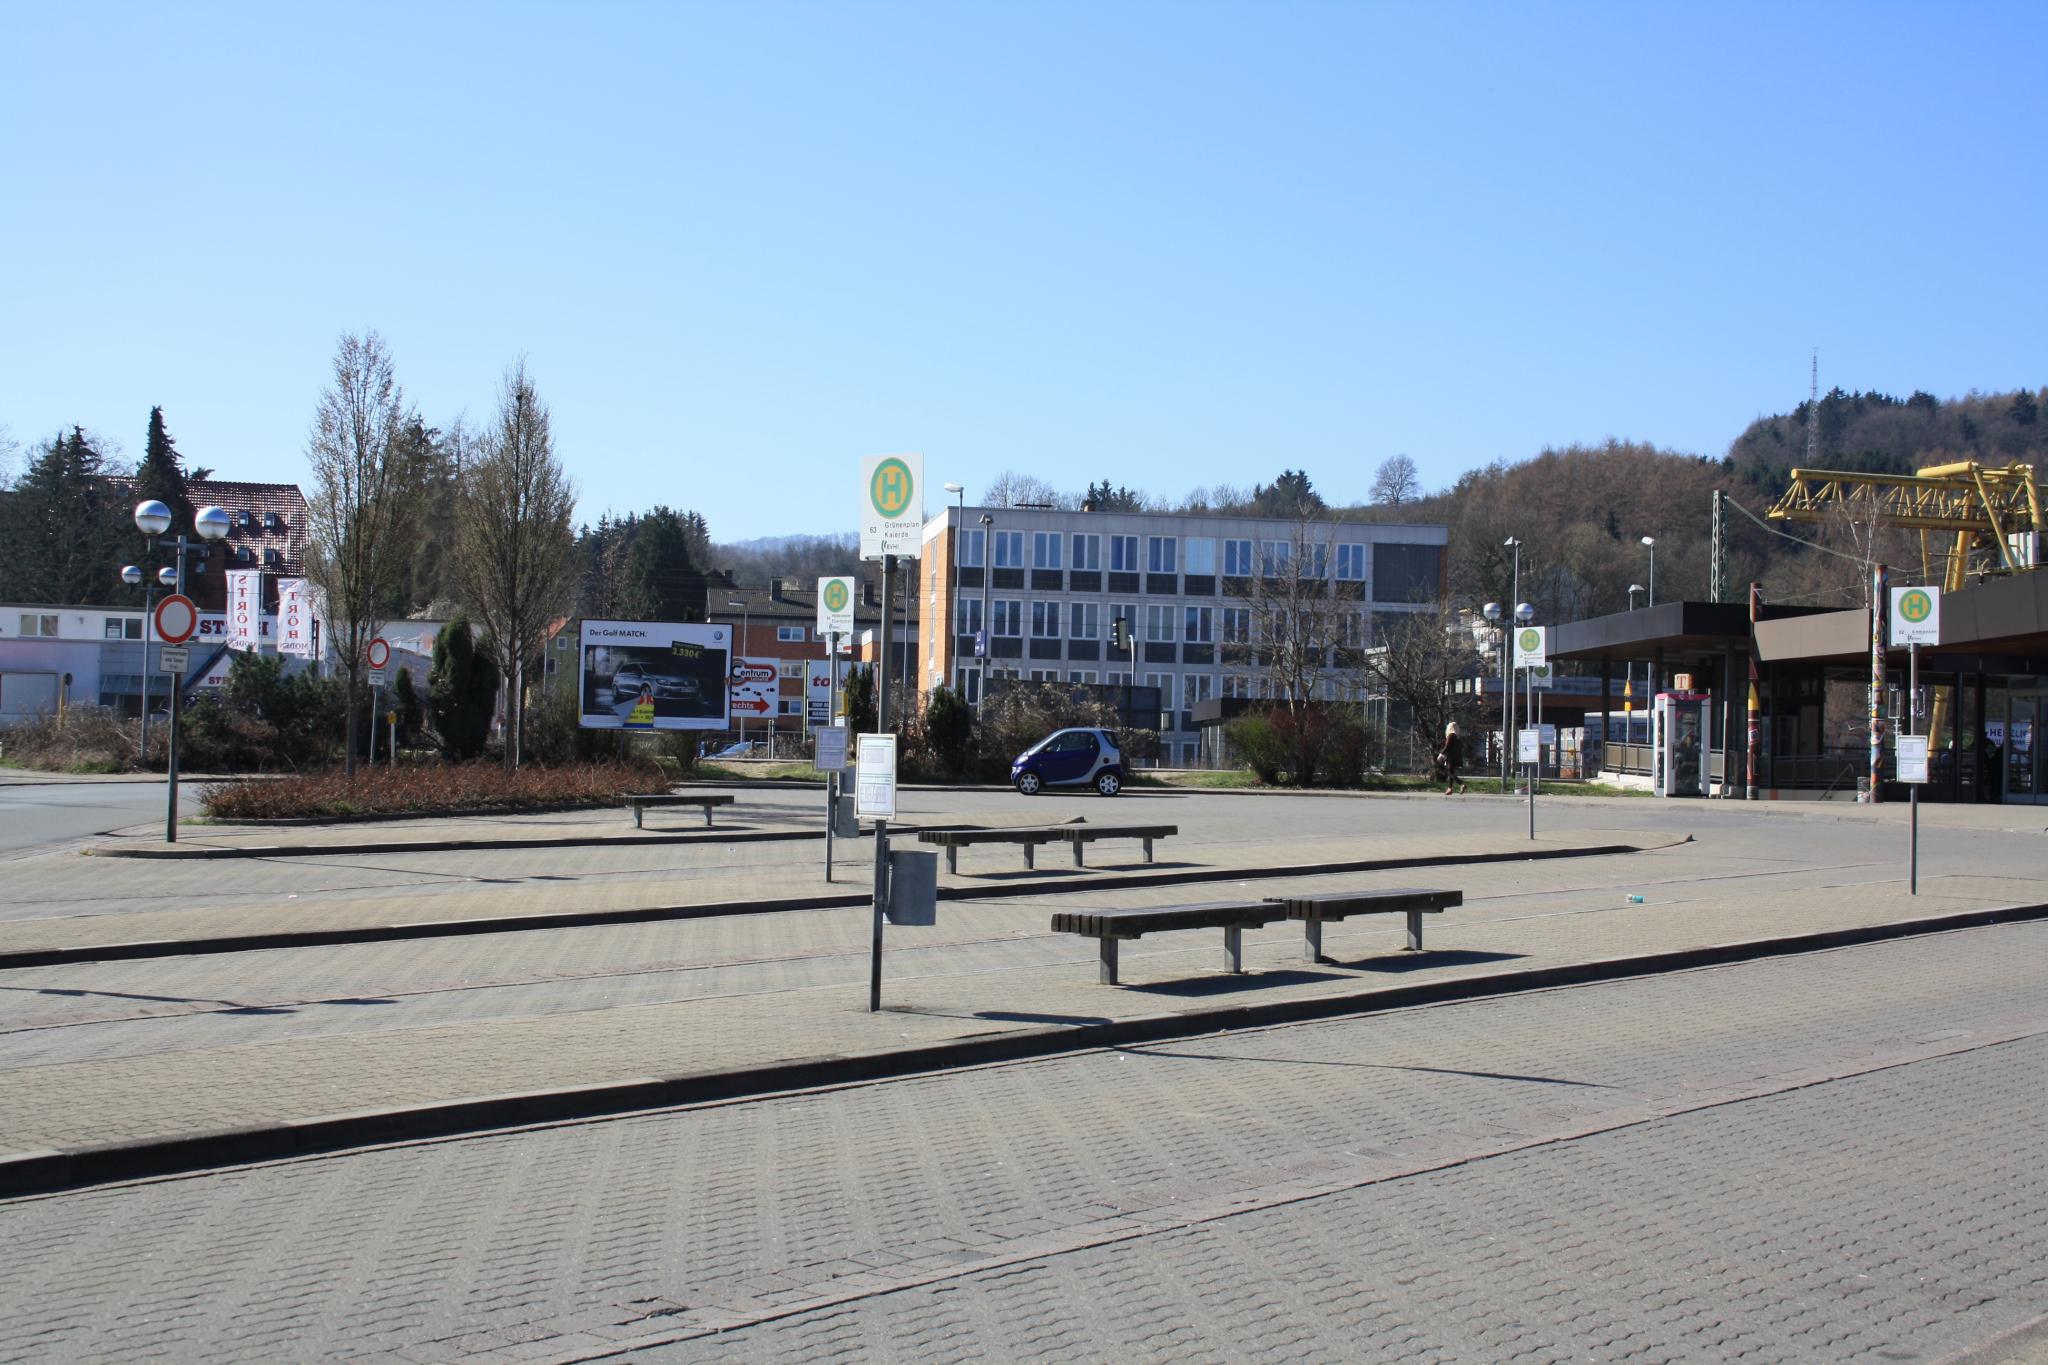 Bahnhofsplatz2012-01-Thielke